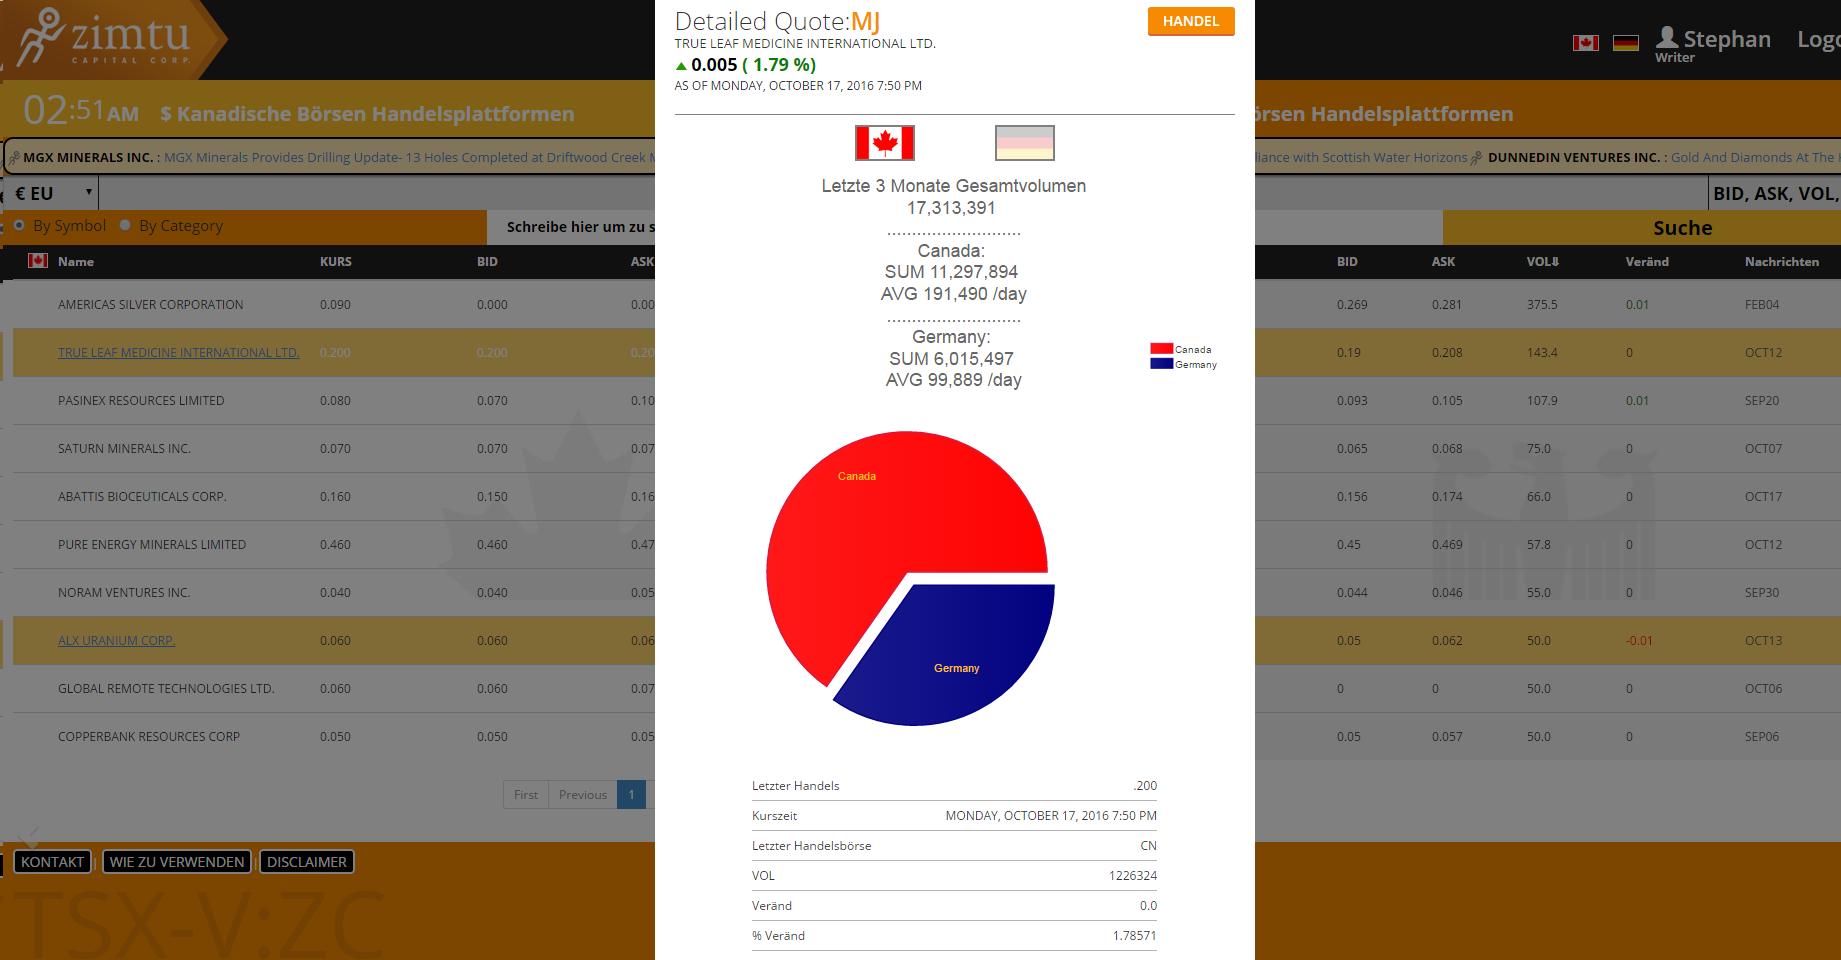 börsen app vergleich www.erotik